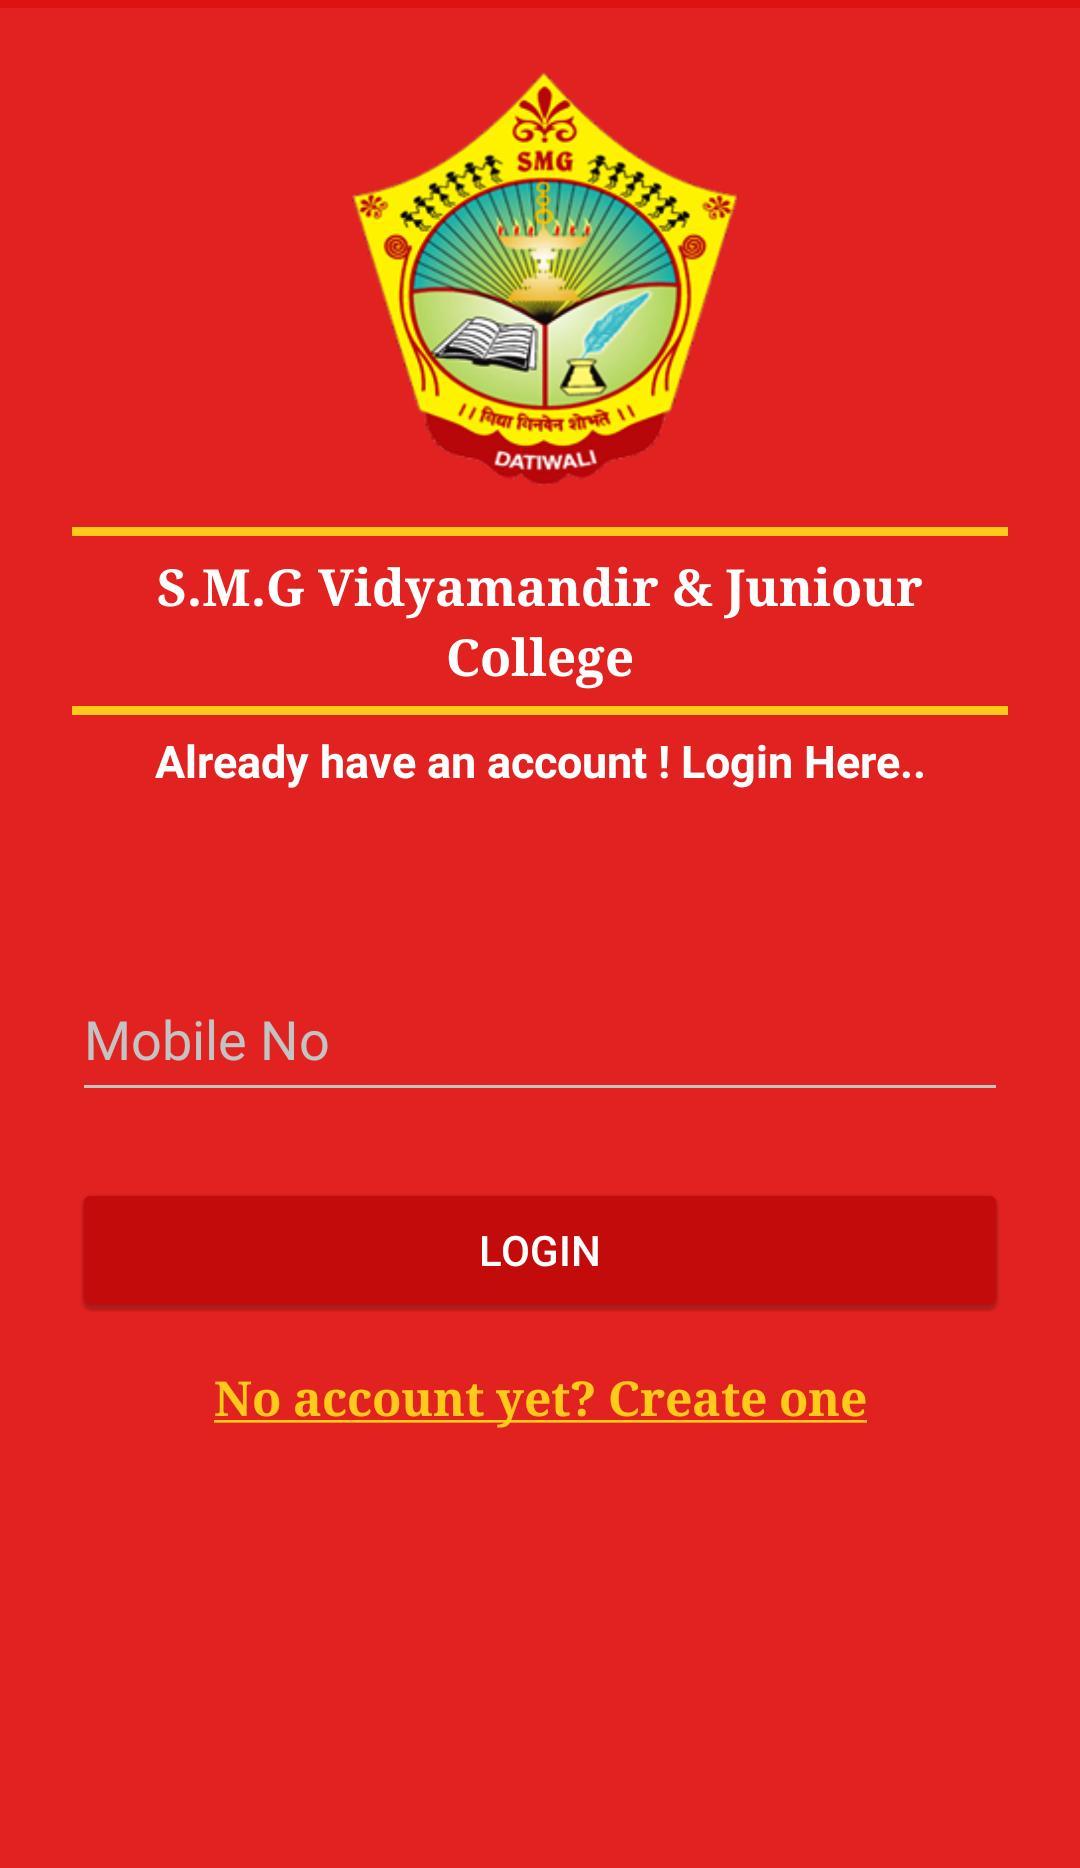 Smg Vidyamandir School For Android Apk Download